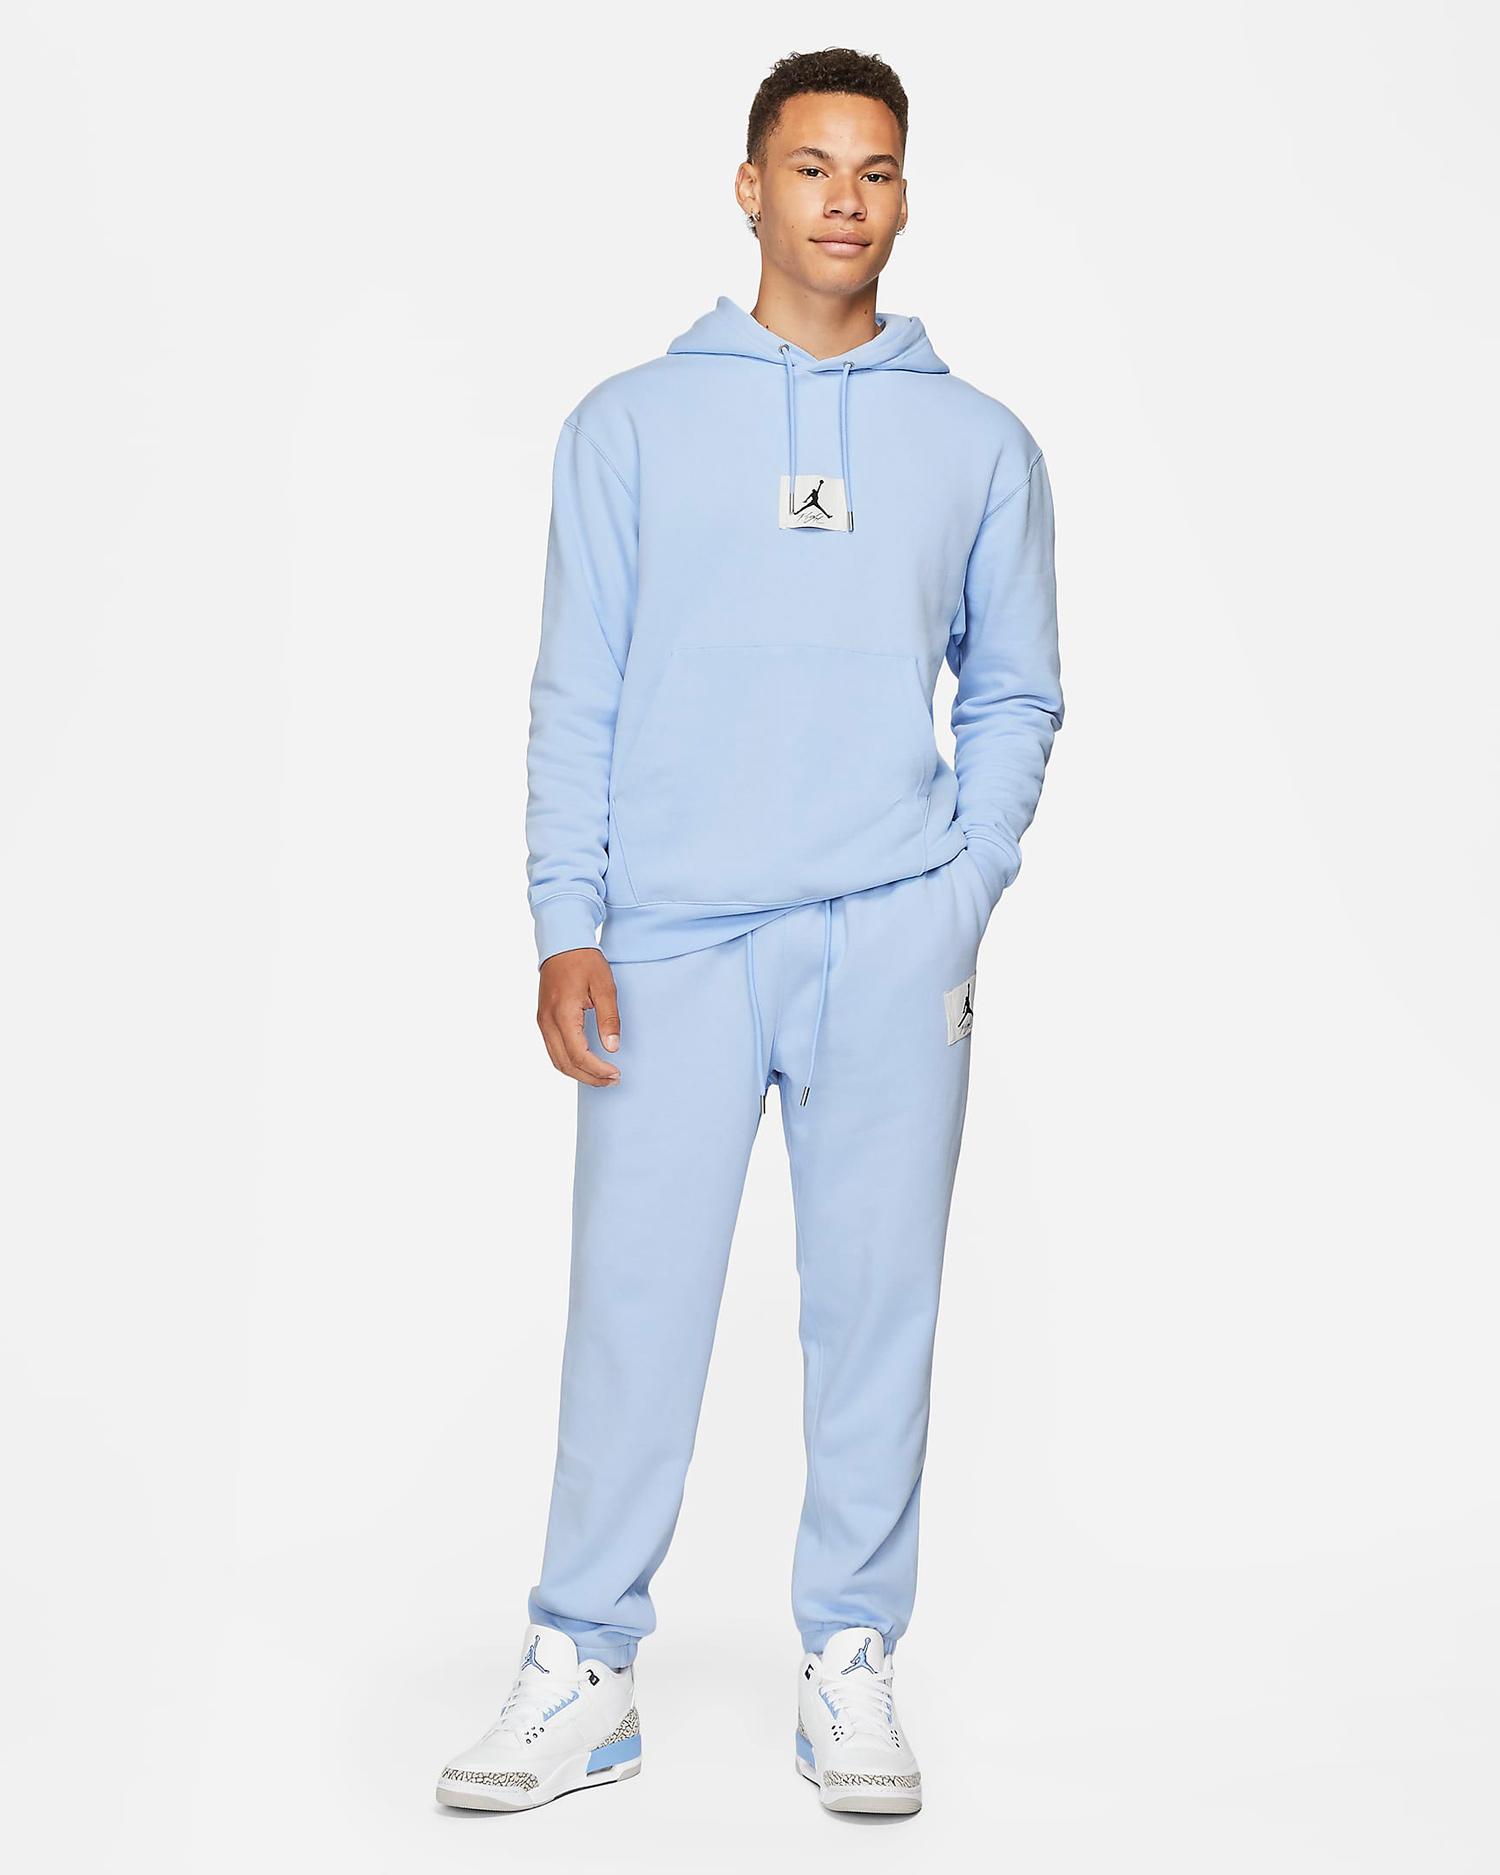 jordan-aluminum-blue-hoodie-and-pants-outfit